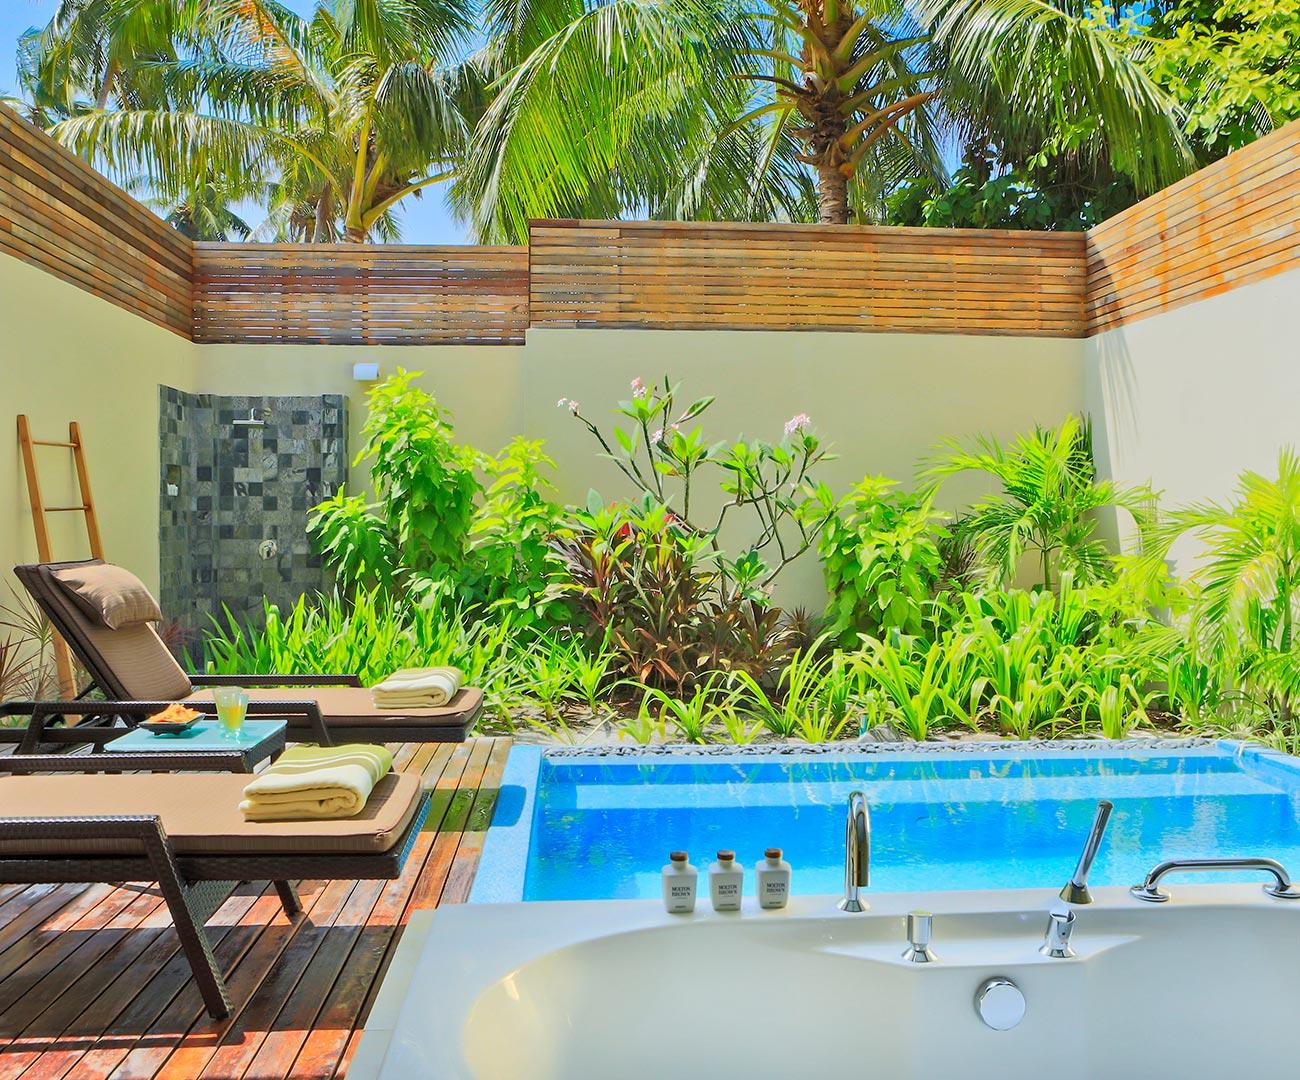 Kurumba Maldives - Garden Pool Villa - Private Pool Image - Maldives Resort